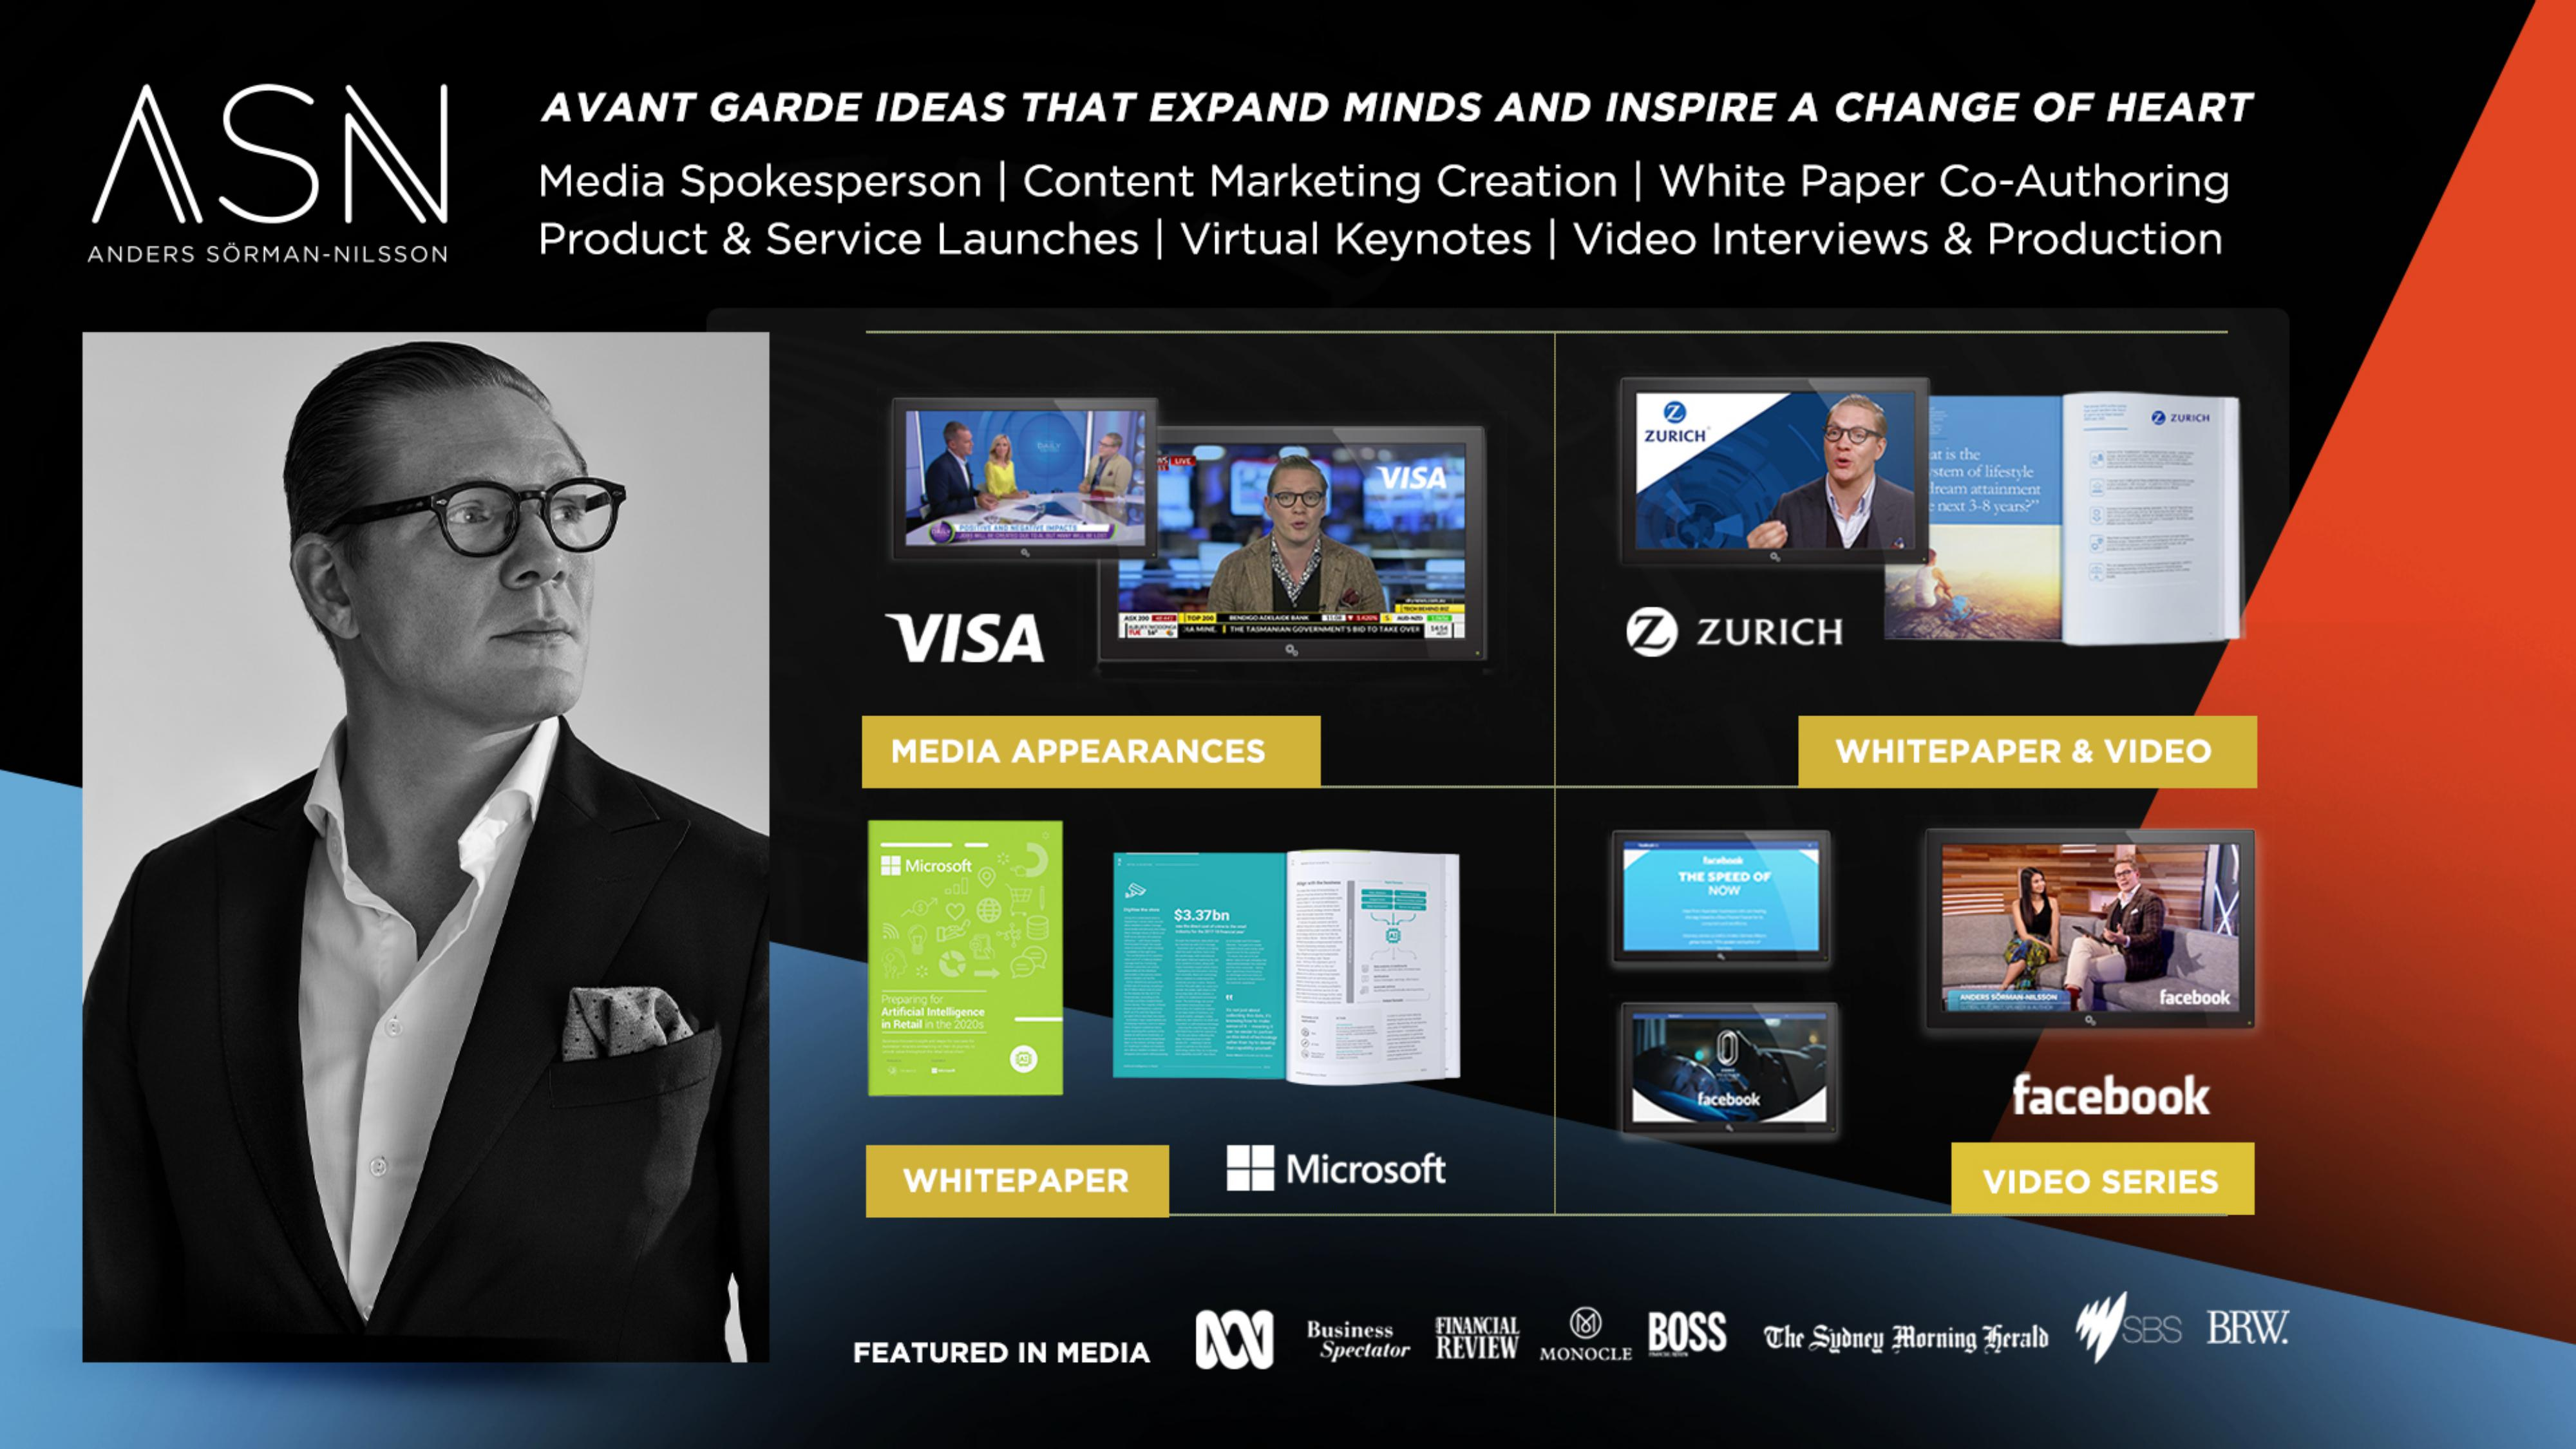 Brand Ambassador Futurist Anders Sorman-Nilsson